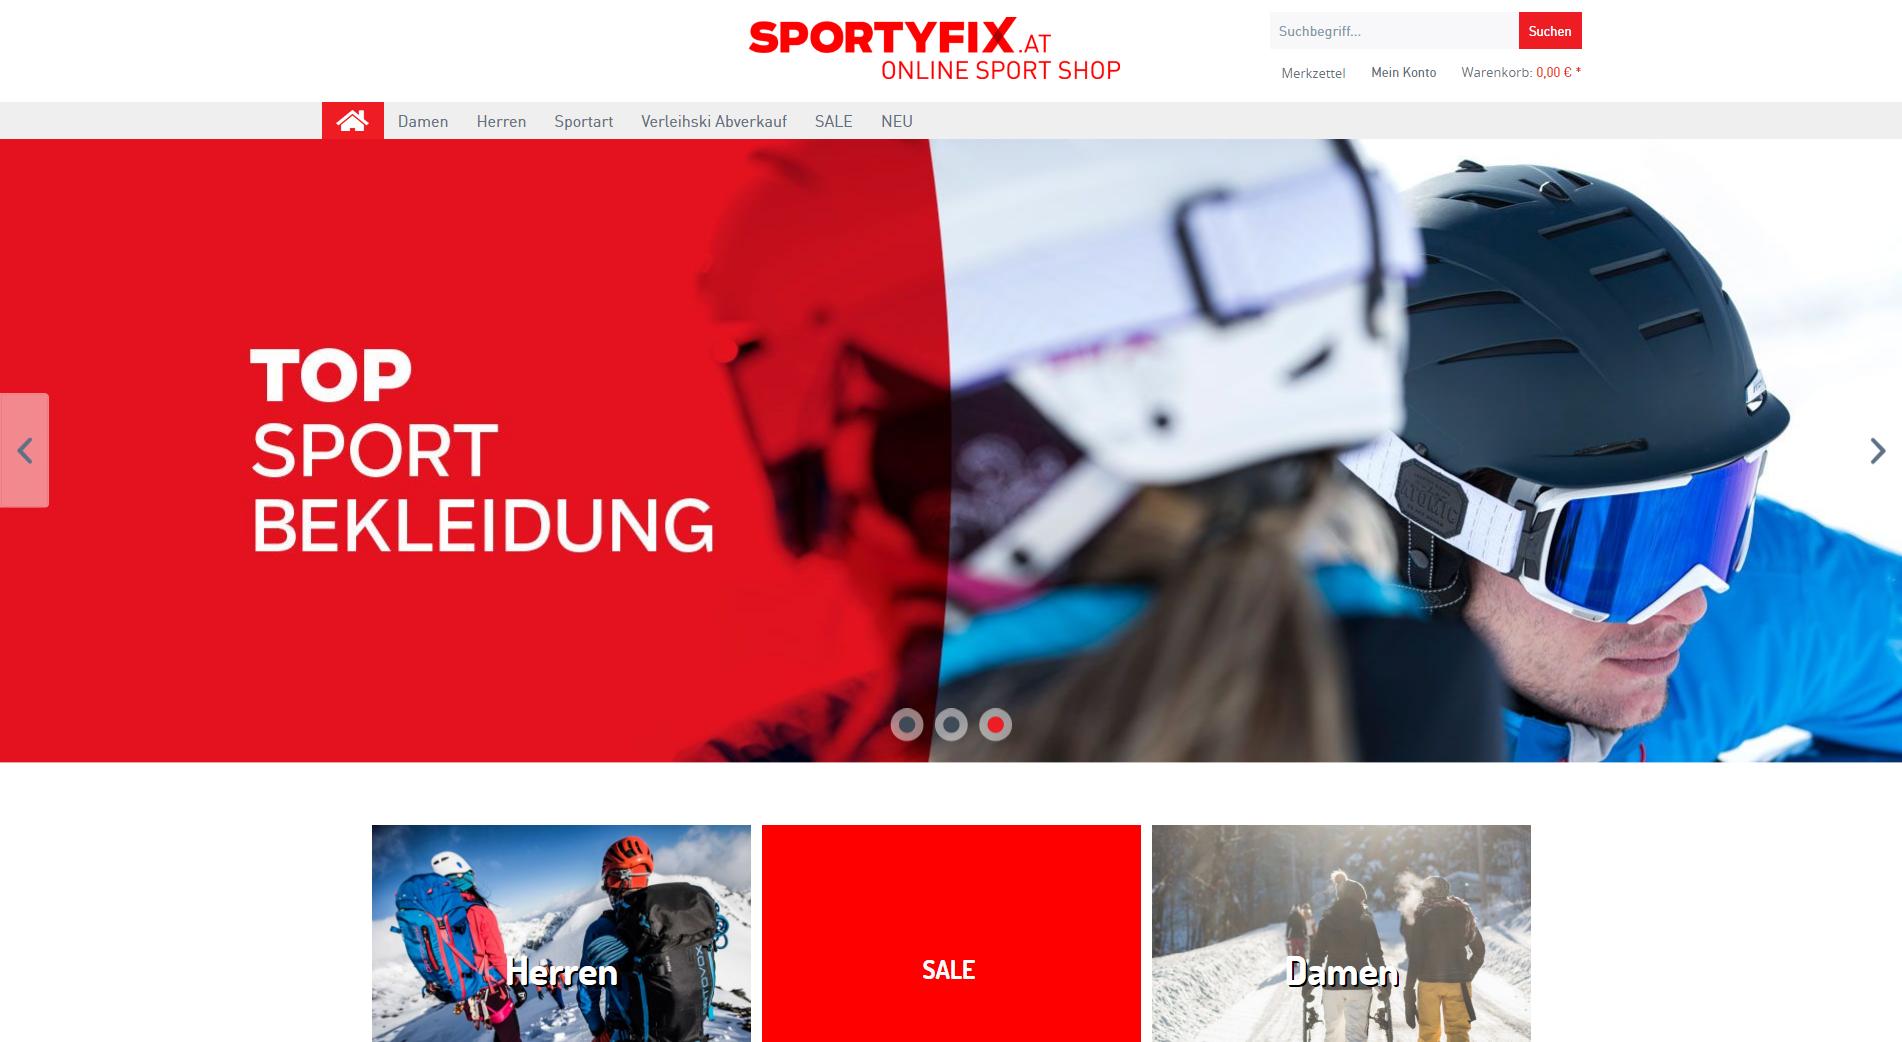 sportyfix-at